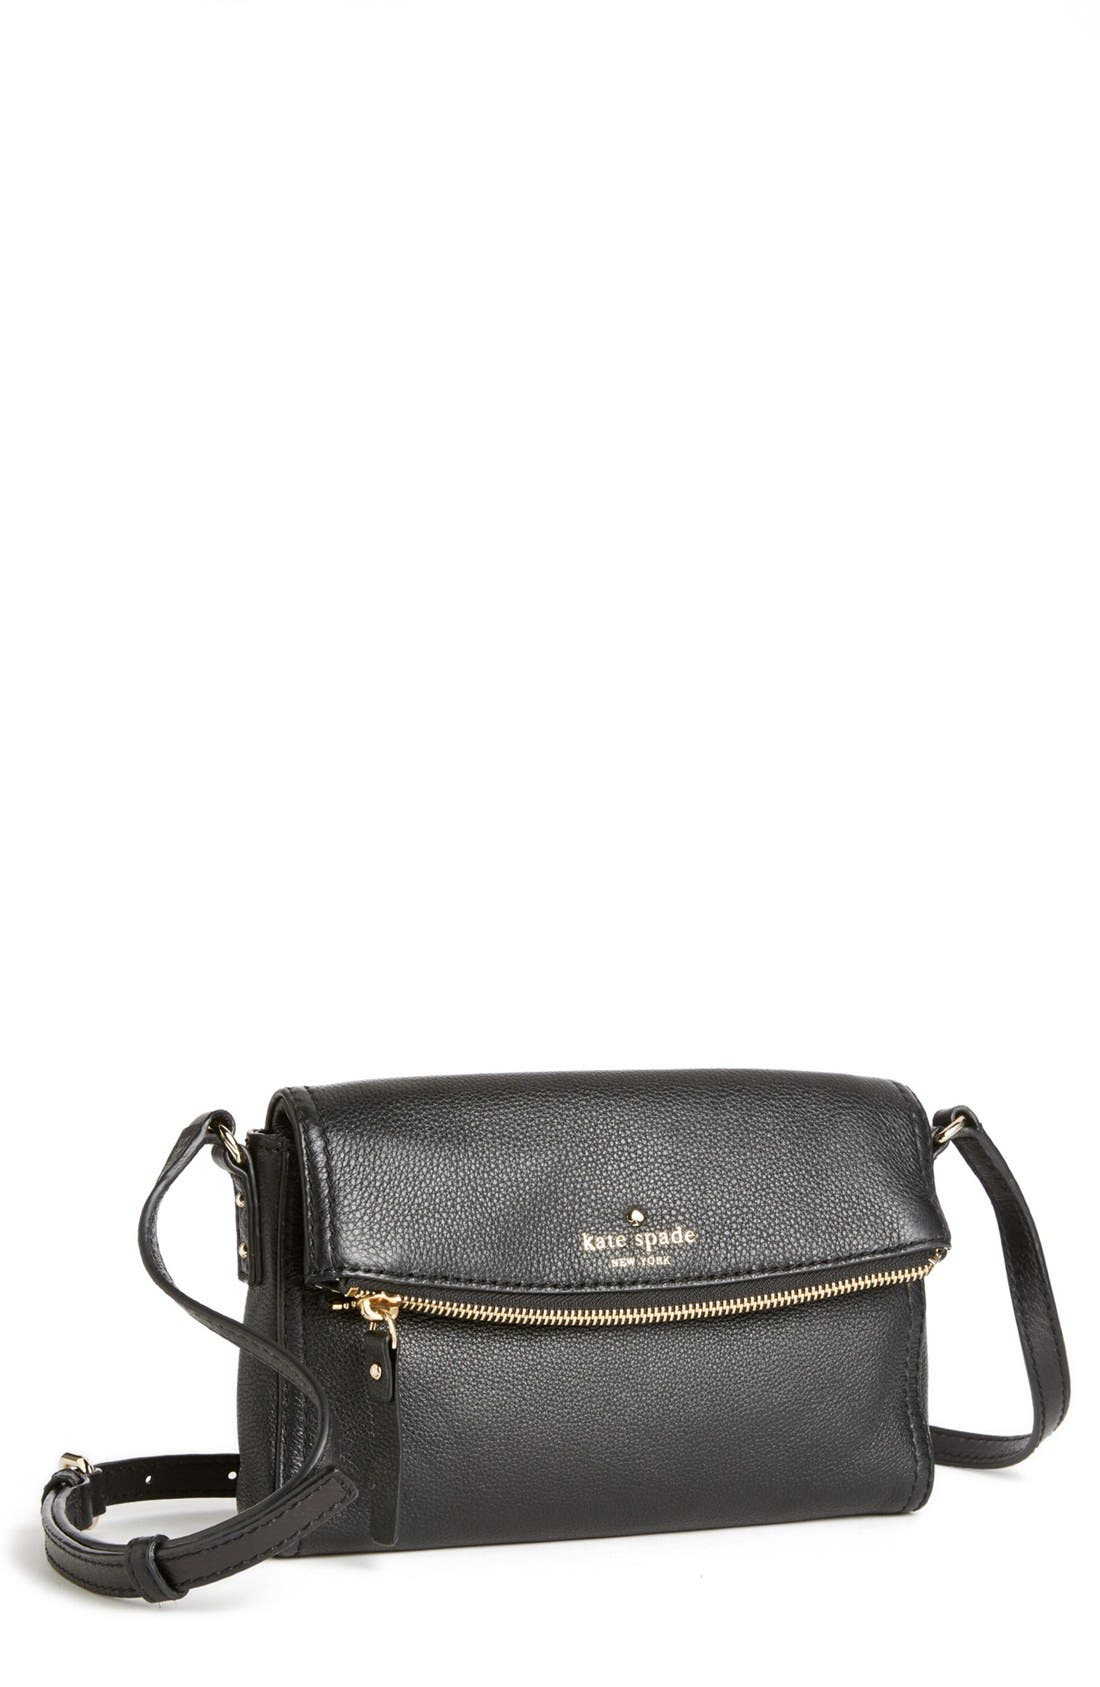 KATE SPADE NEW YORK 'cobble hill - mini carson' crossbody bag, Main, color, 001